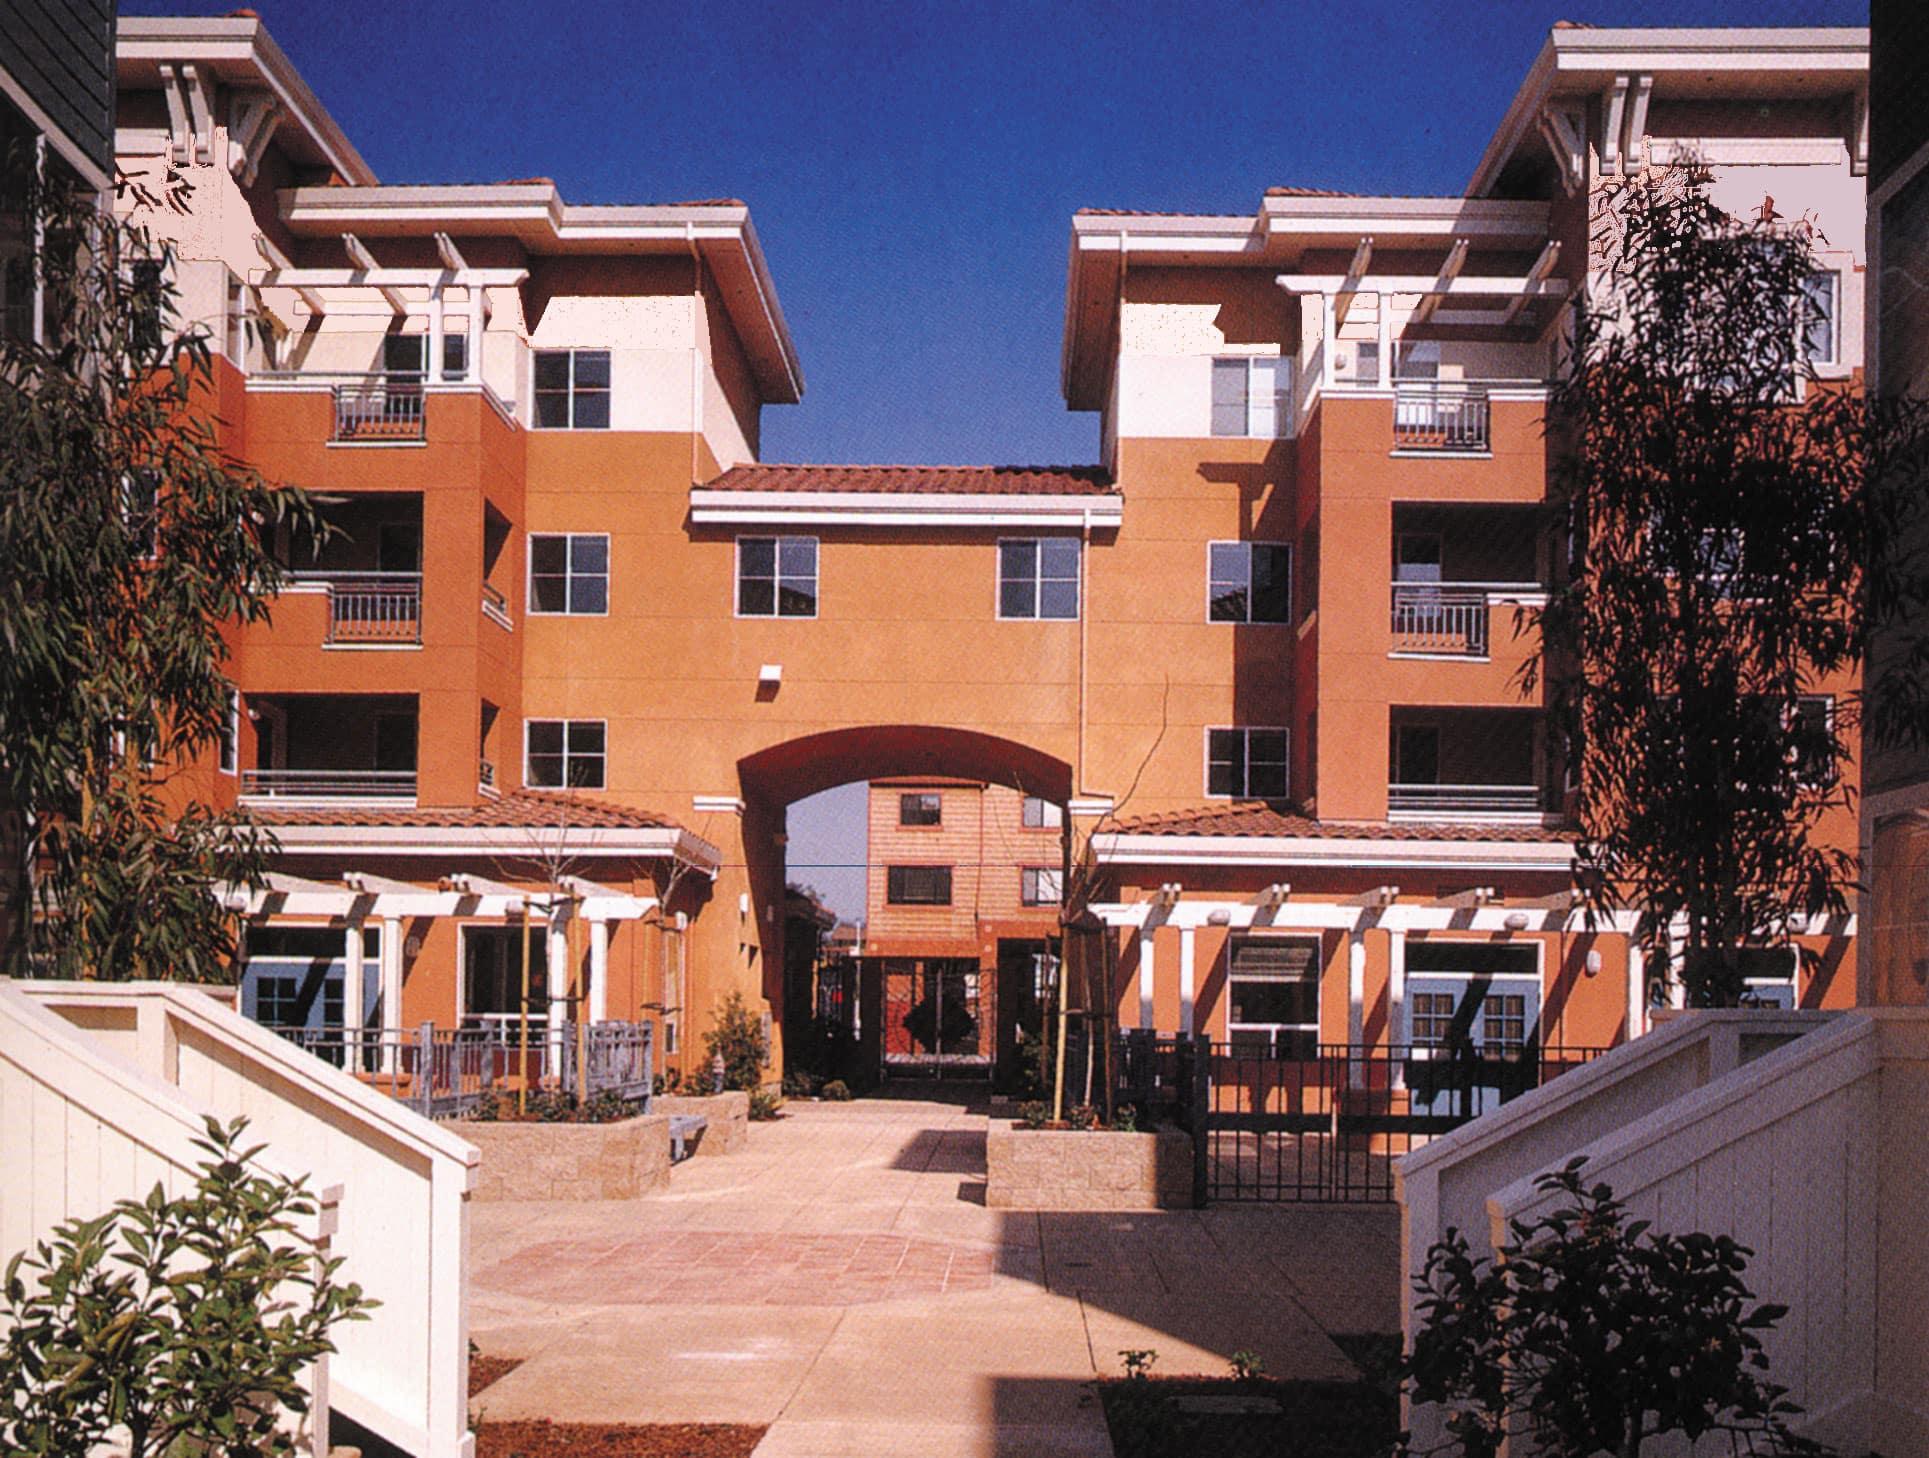 San Antonio Terrace Court Yard View